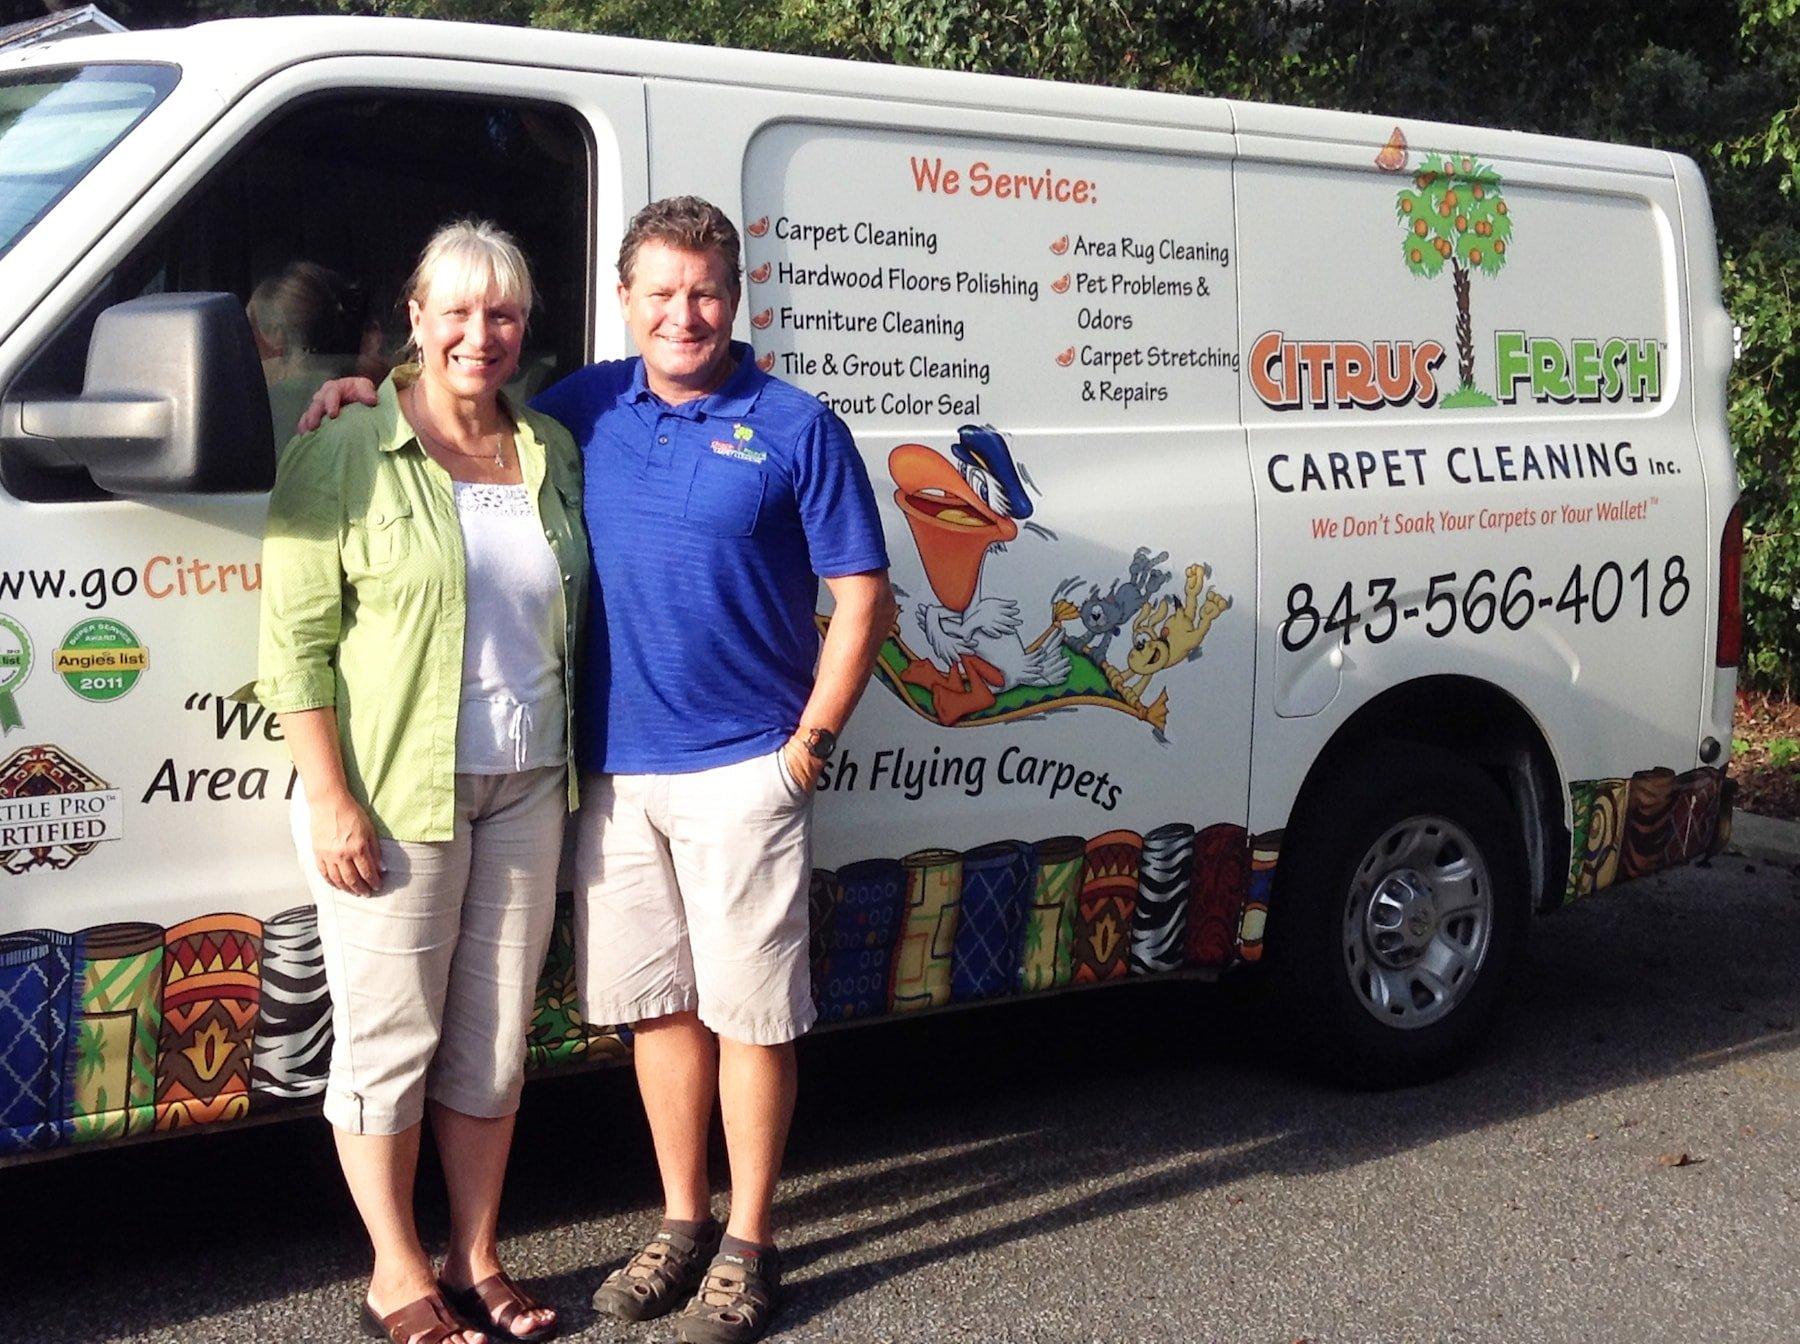 Citrus Fresh Team Greg Mary Broome Citrus Fresh Carpet